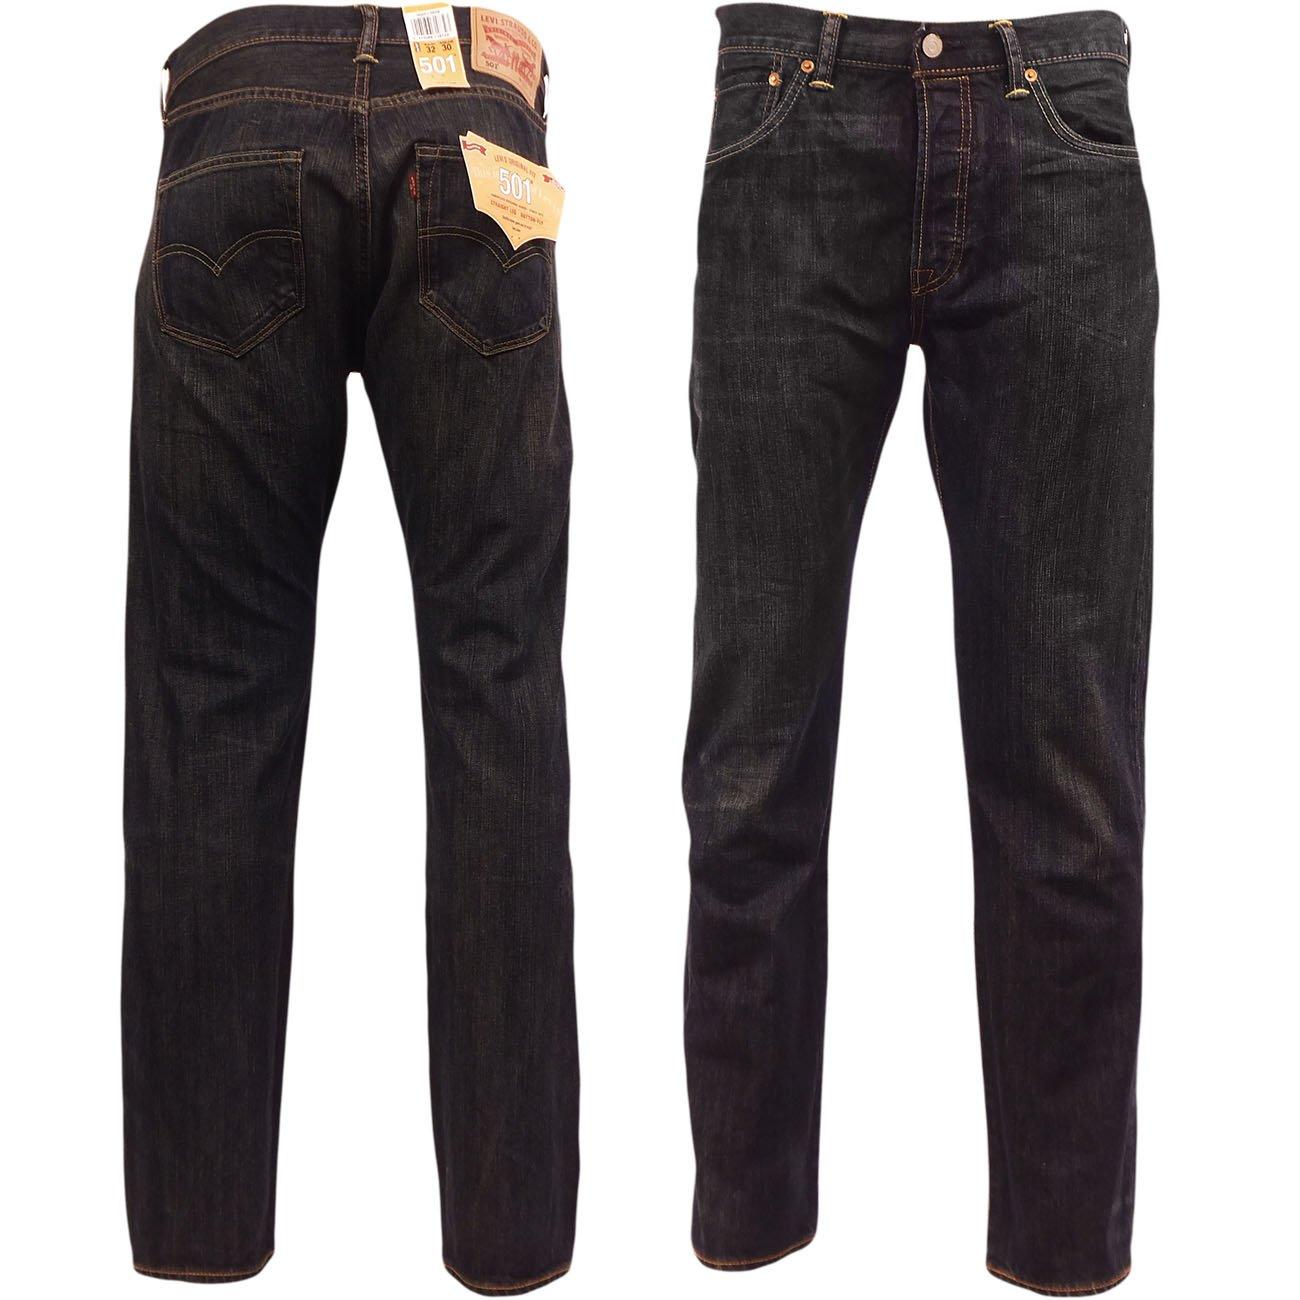 black jeans mens style photo - 1